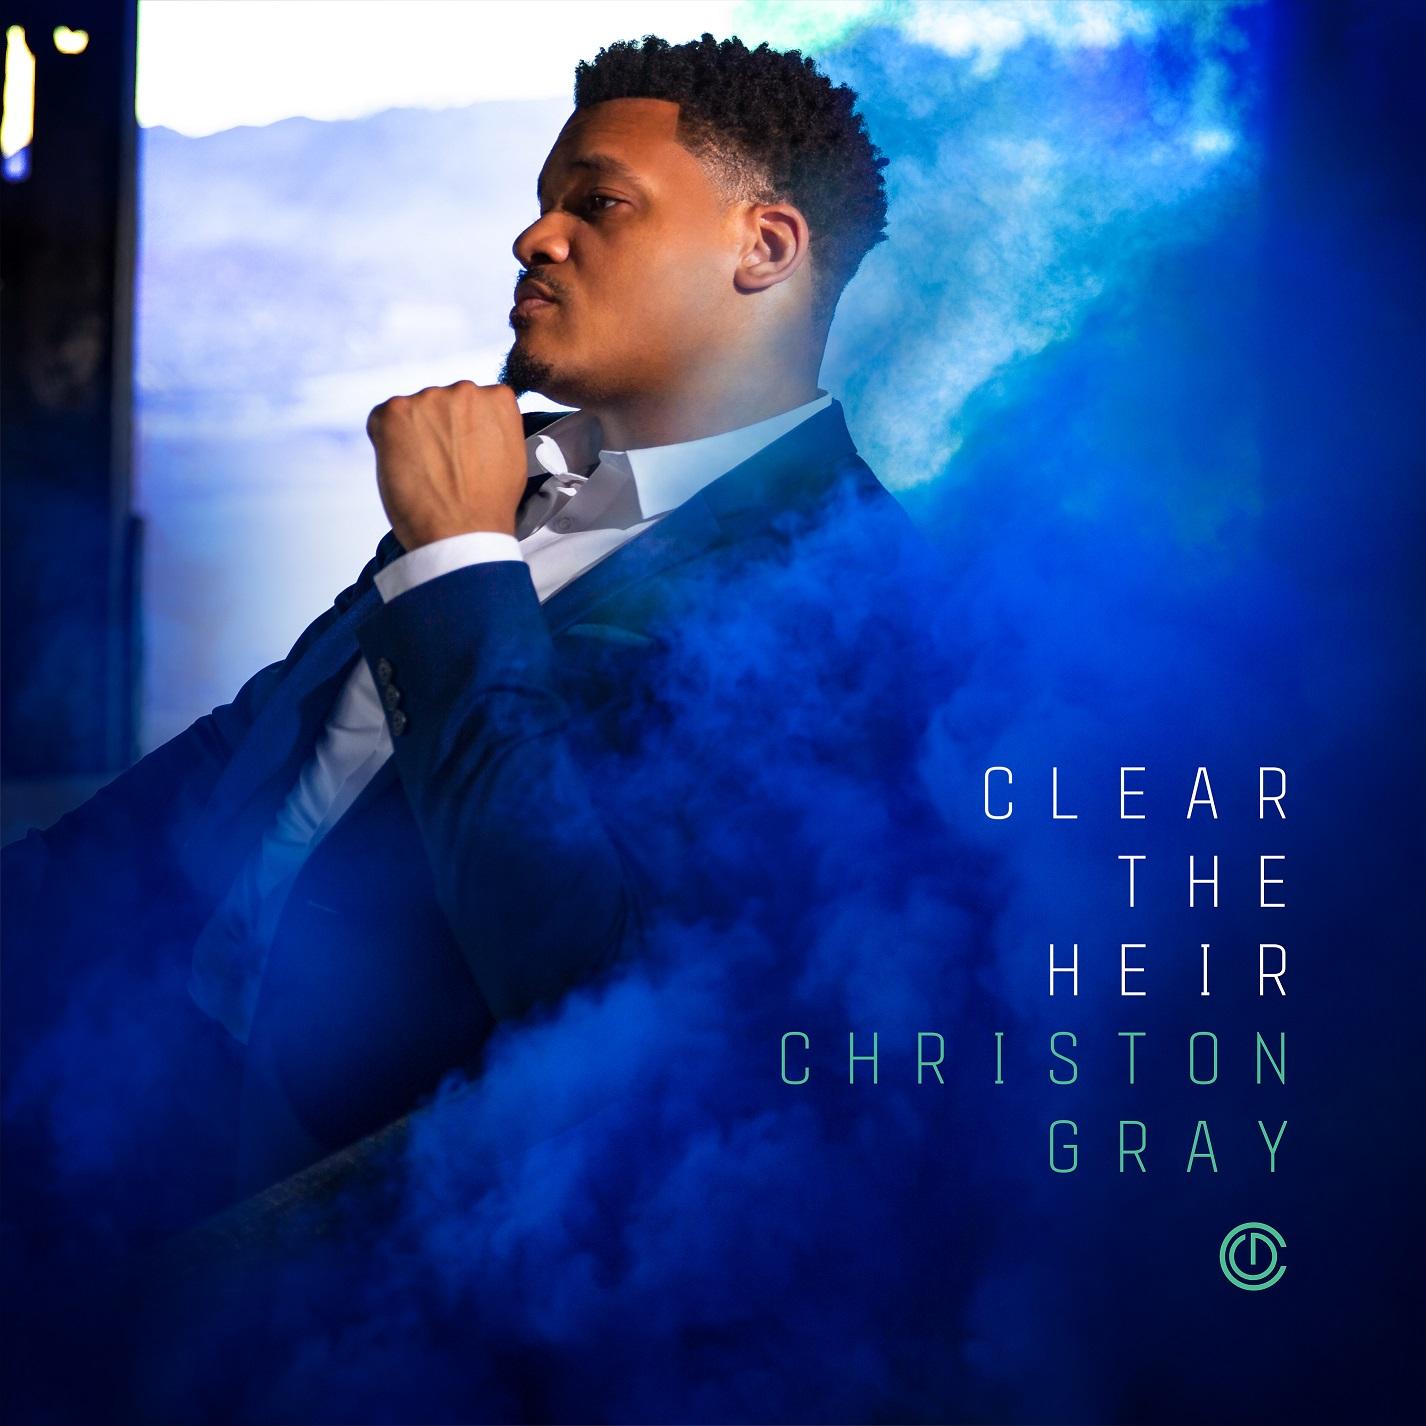 Christon Gray_Clear The Heir_album cover